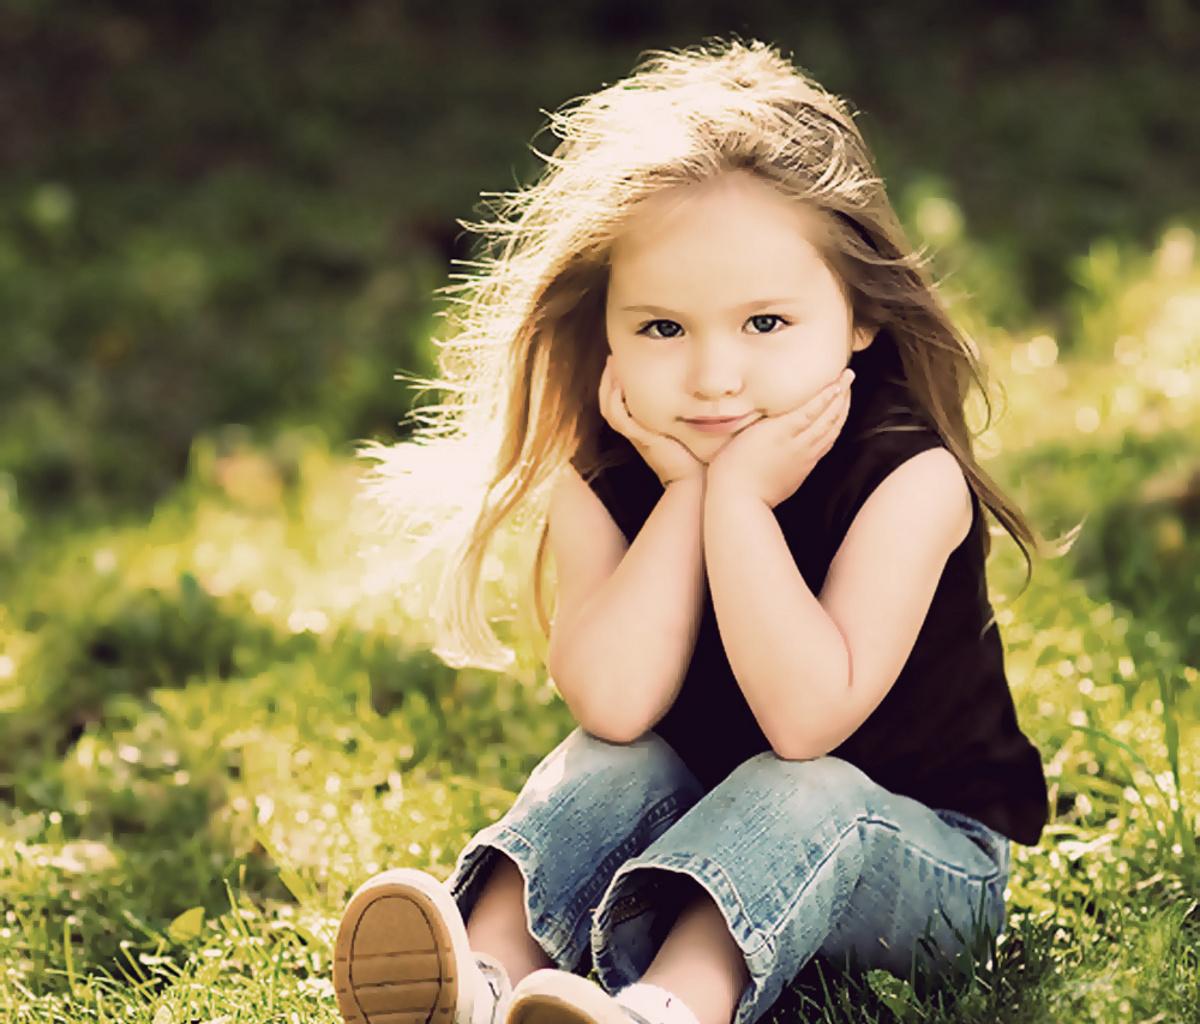 Baby Boy Hd Wallpapers: صور اطفال حلوة جميلة خلفيات و رمزيات اطفال HD